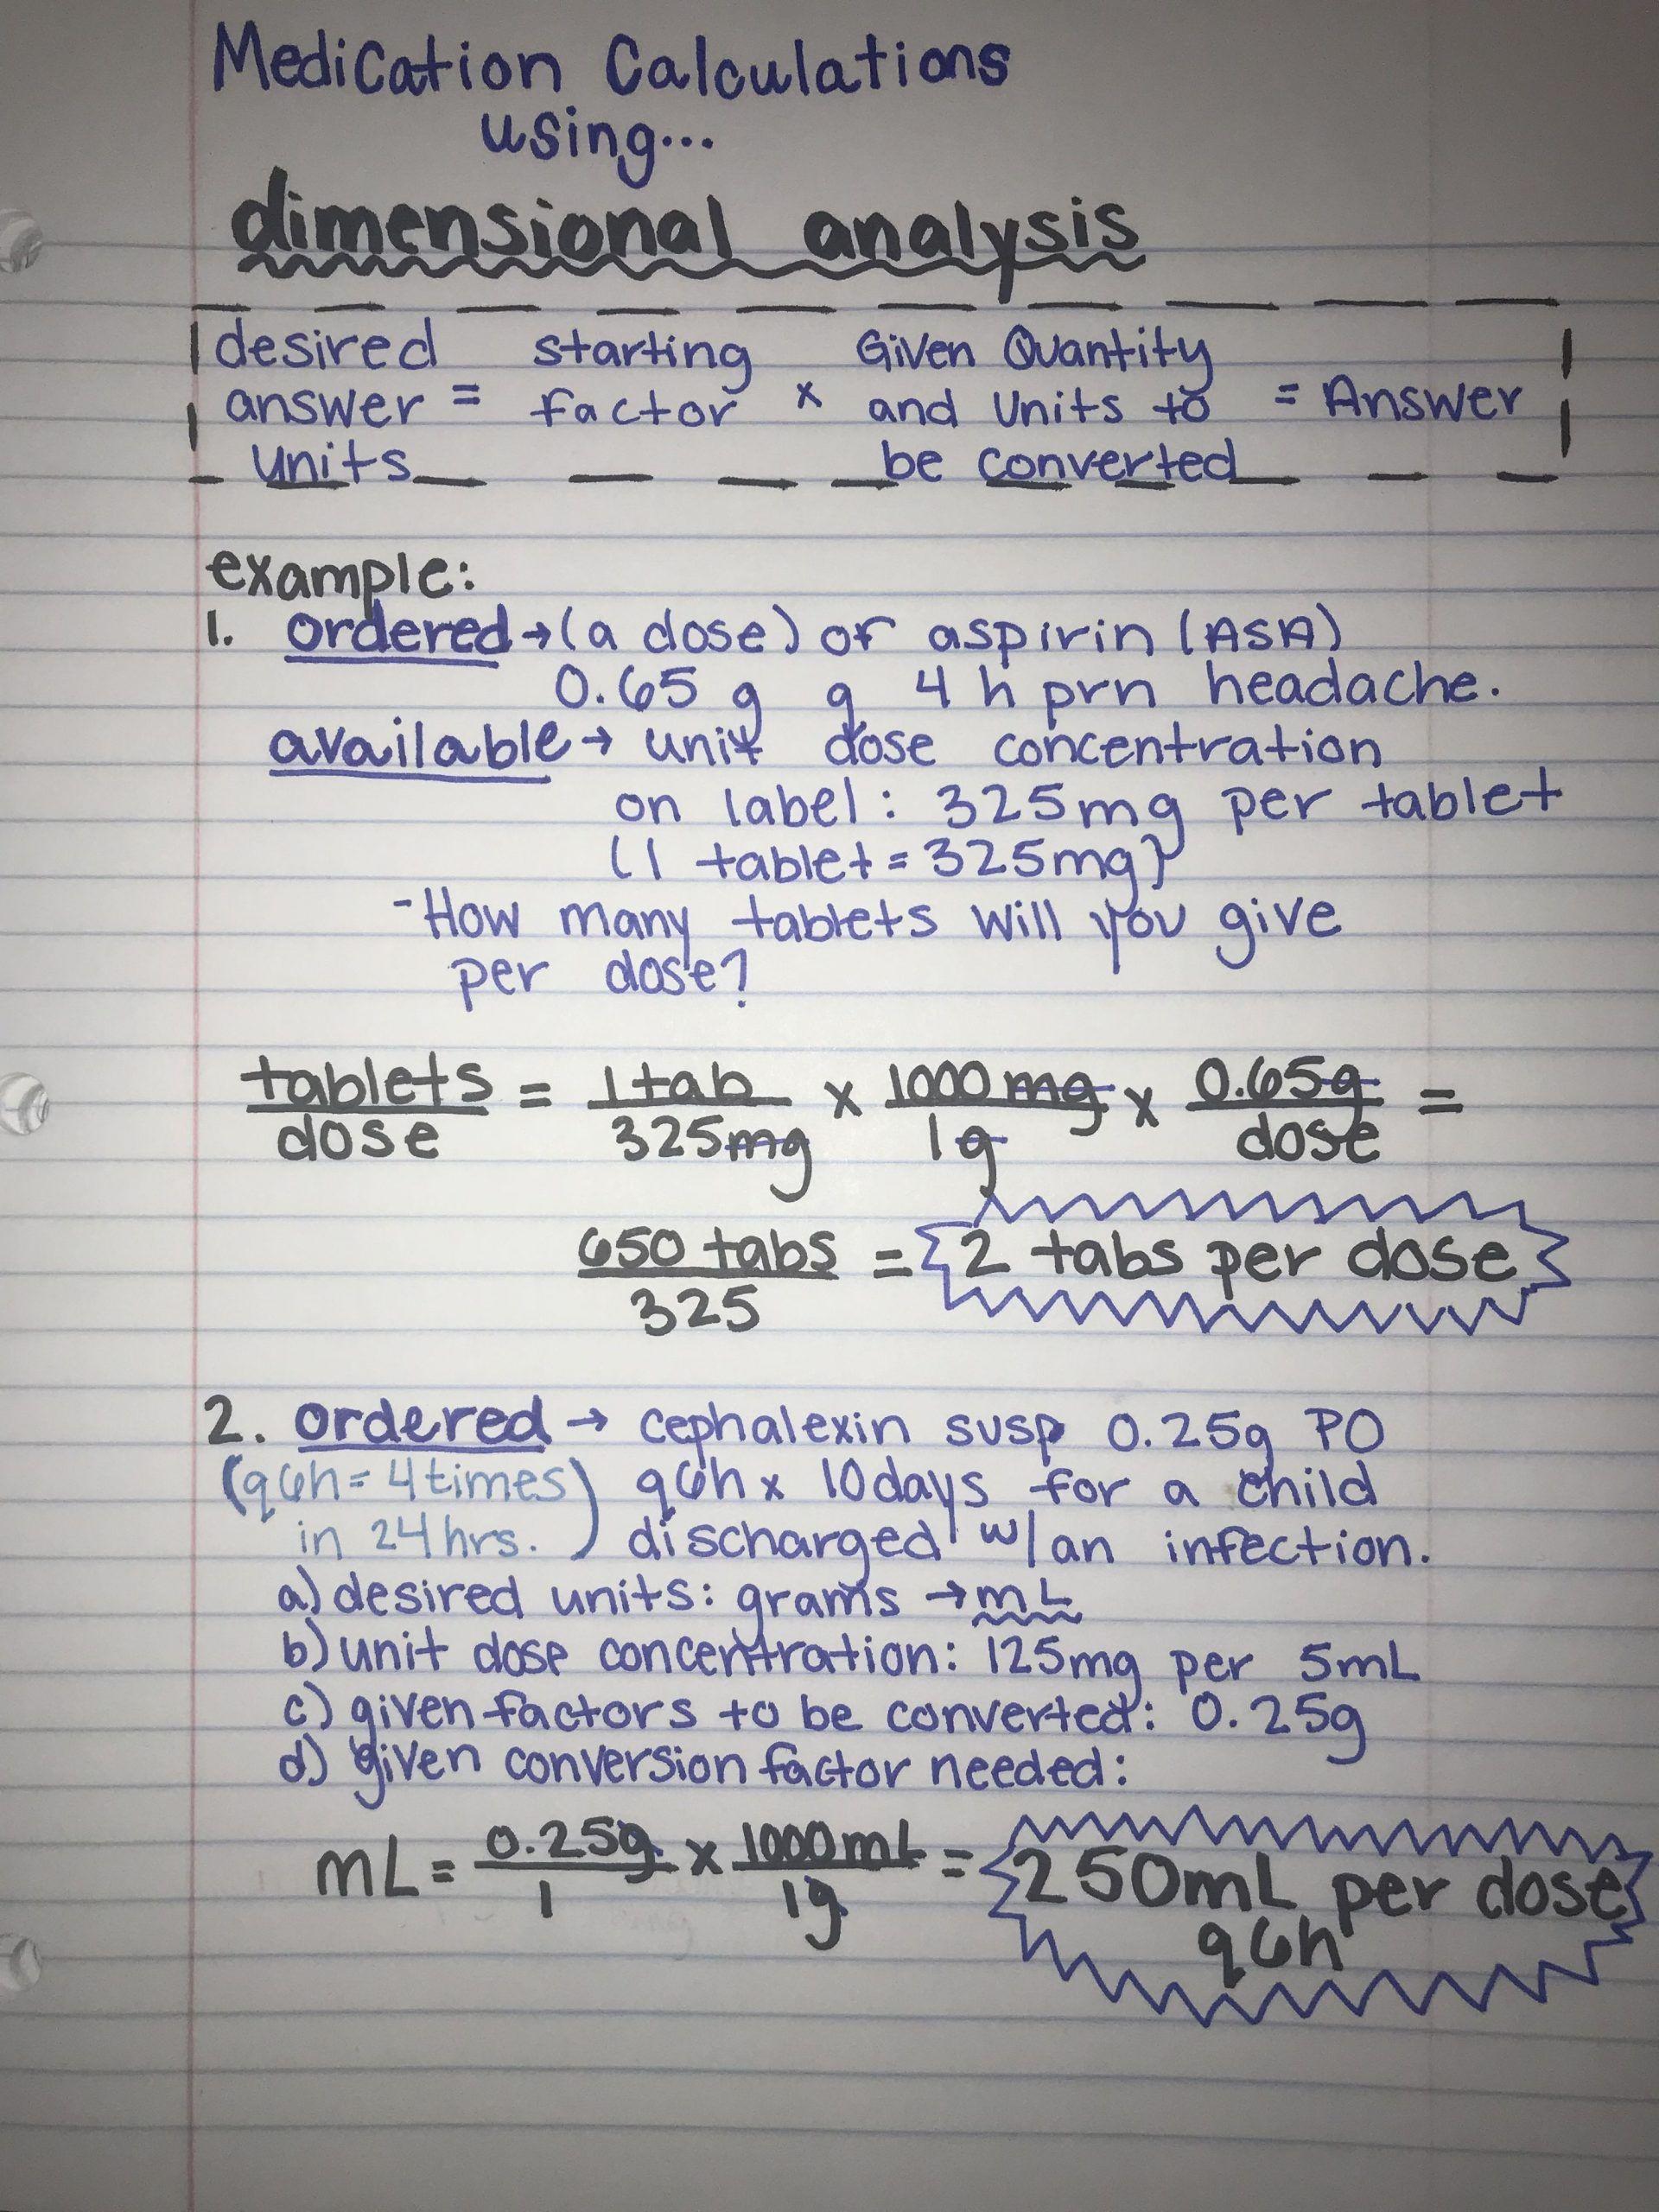 Dimensional Analysis Worksheet 2 Medication Calculations Using Dimensional Analysis With In 2020 Nursing School Notes Nursing Math Nursing Student Tips